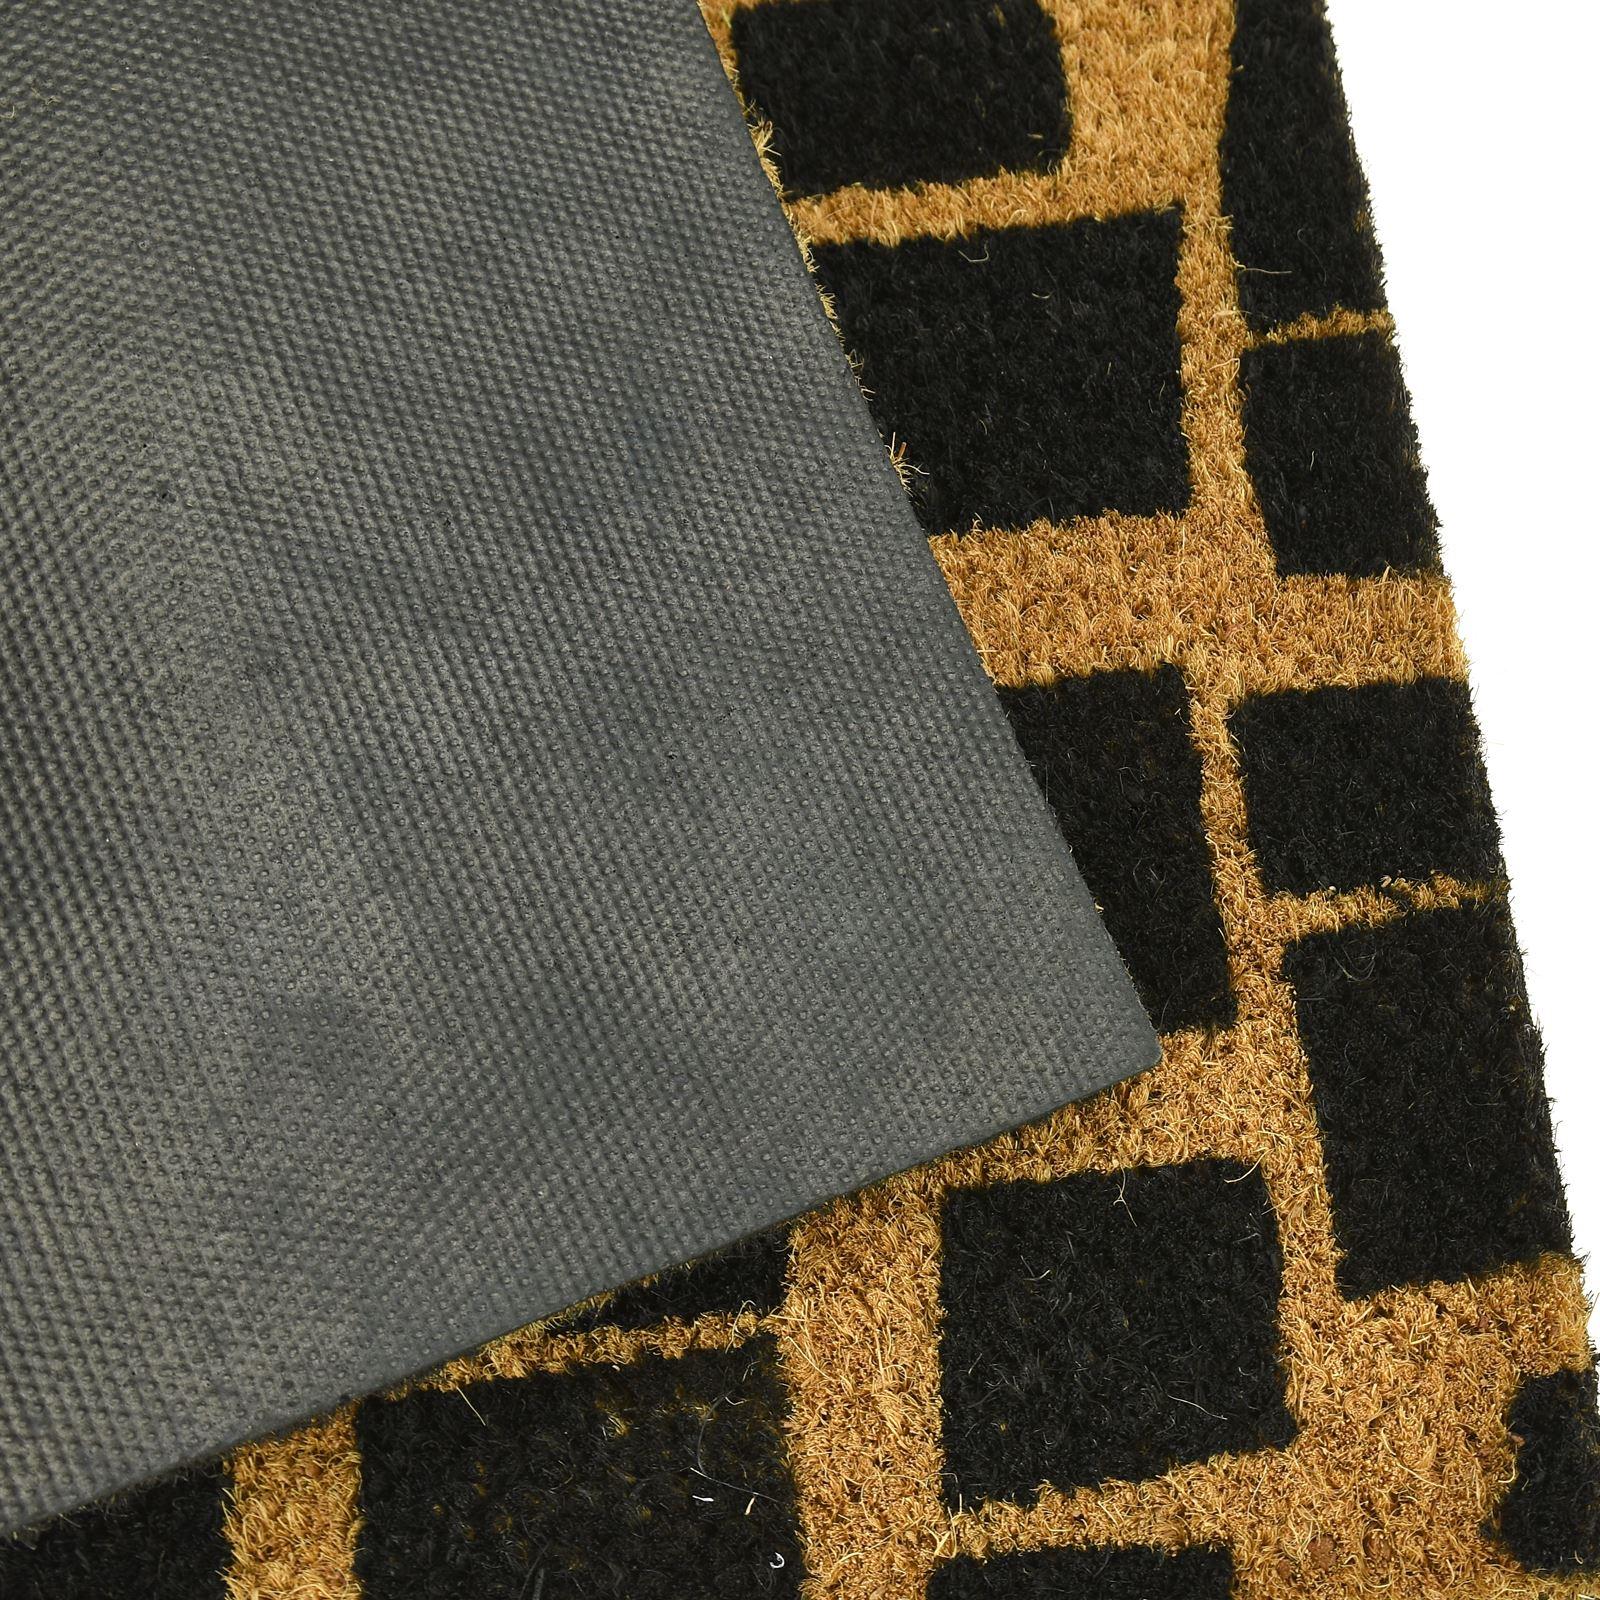 Plain-Non-Slip-Door-Mat-Tough-Natural-Coir-PVC-Back-Welcome-Doormat-40-x-60cm miniatura 22